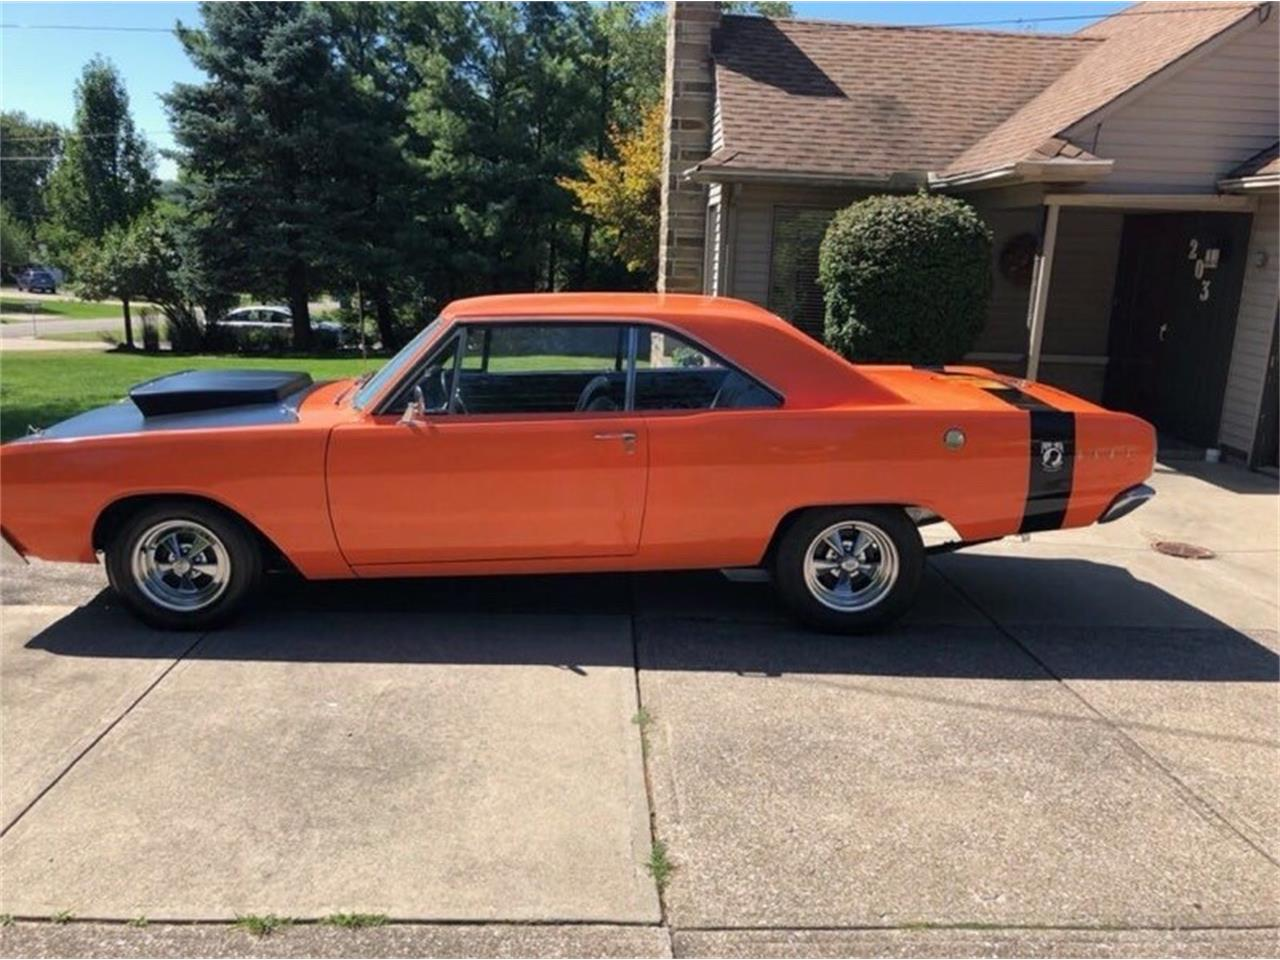 For Sale: 1967 Dodge Dart in Seven Hills, Ohio